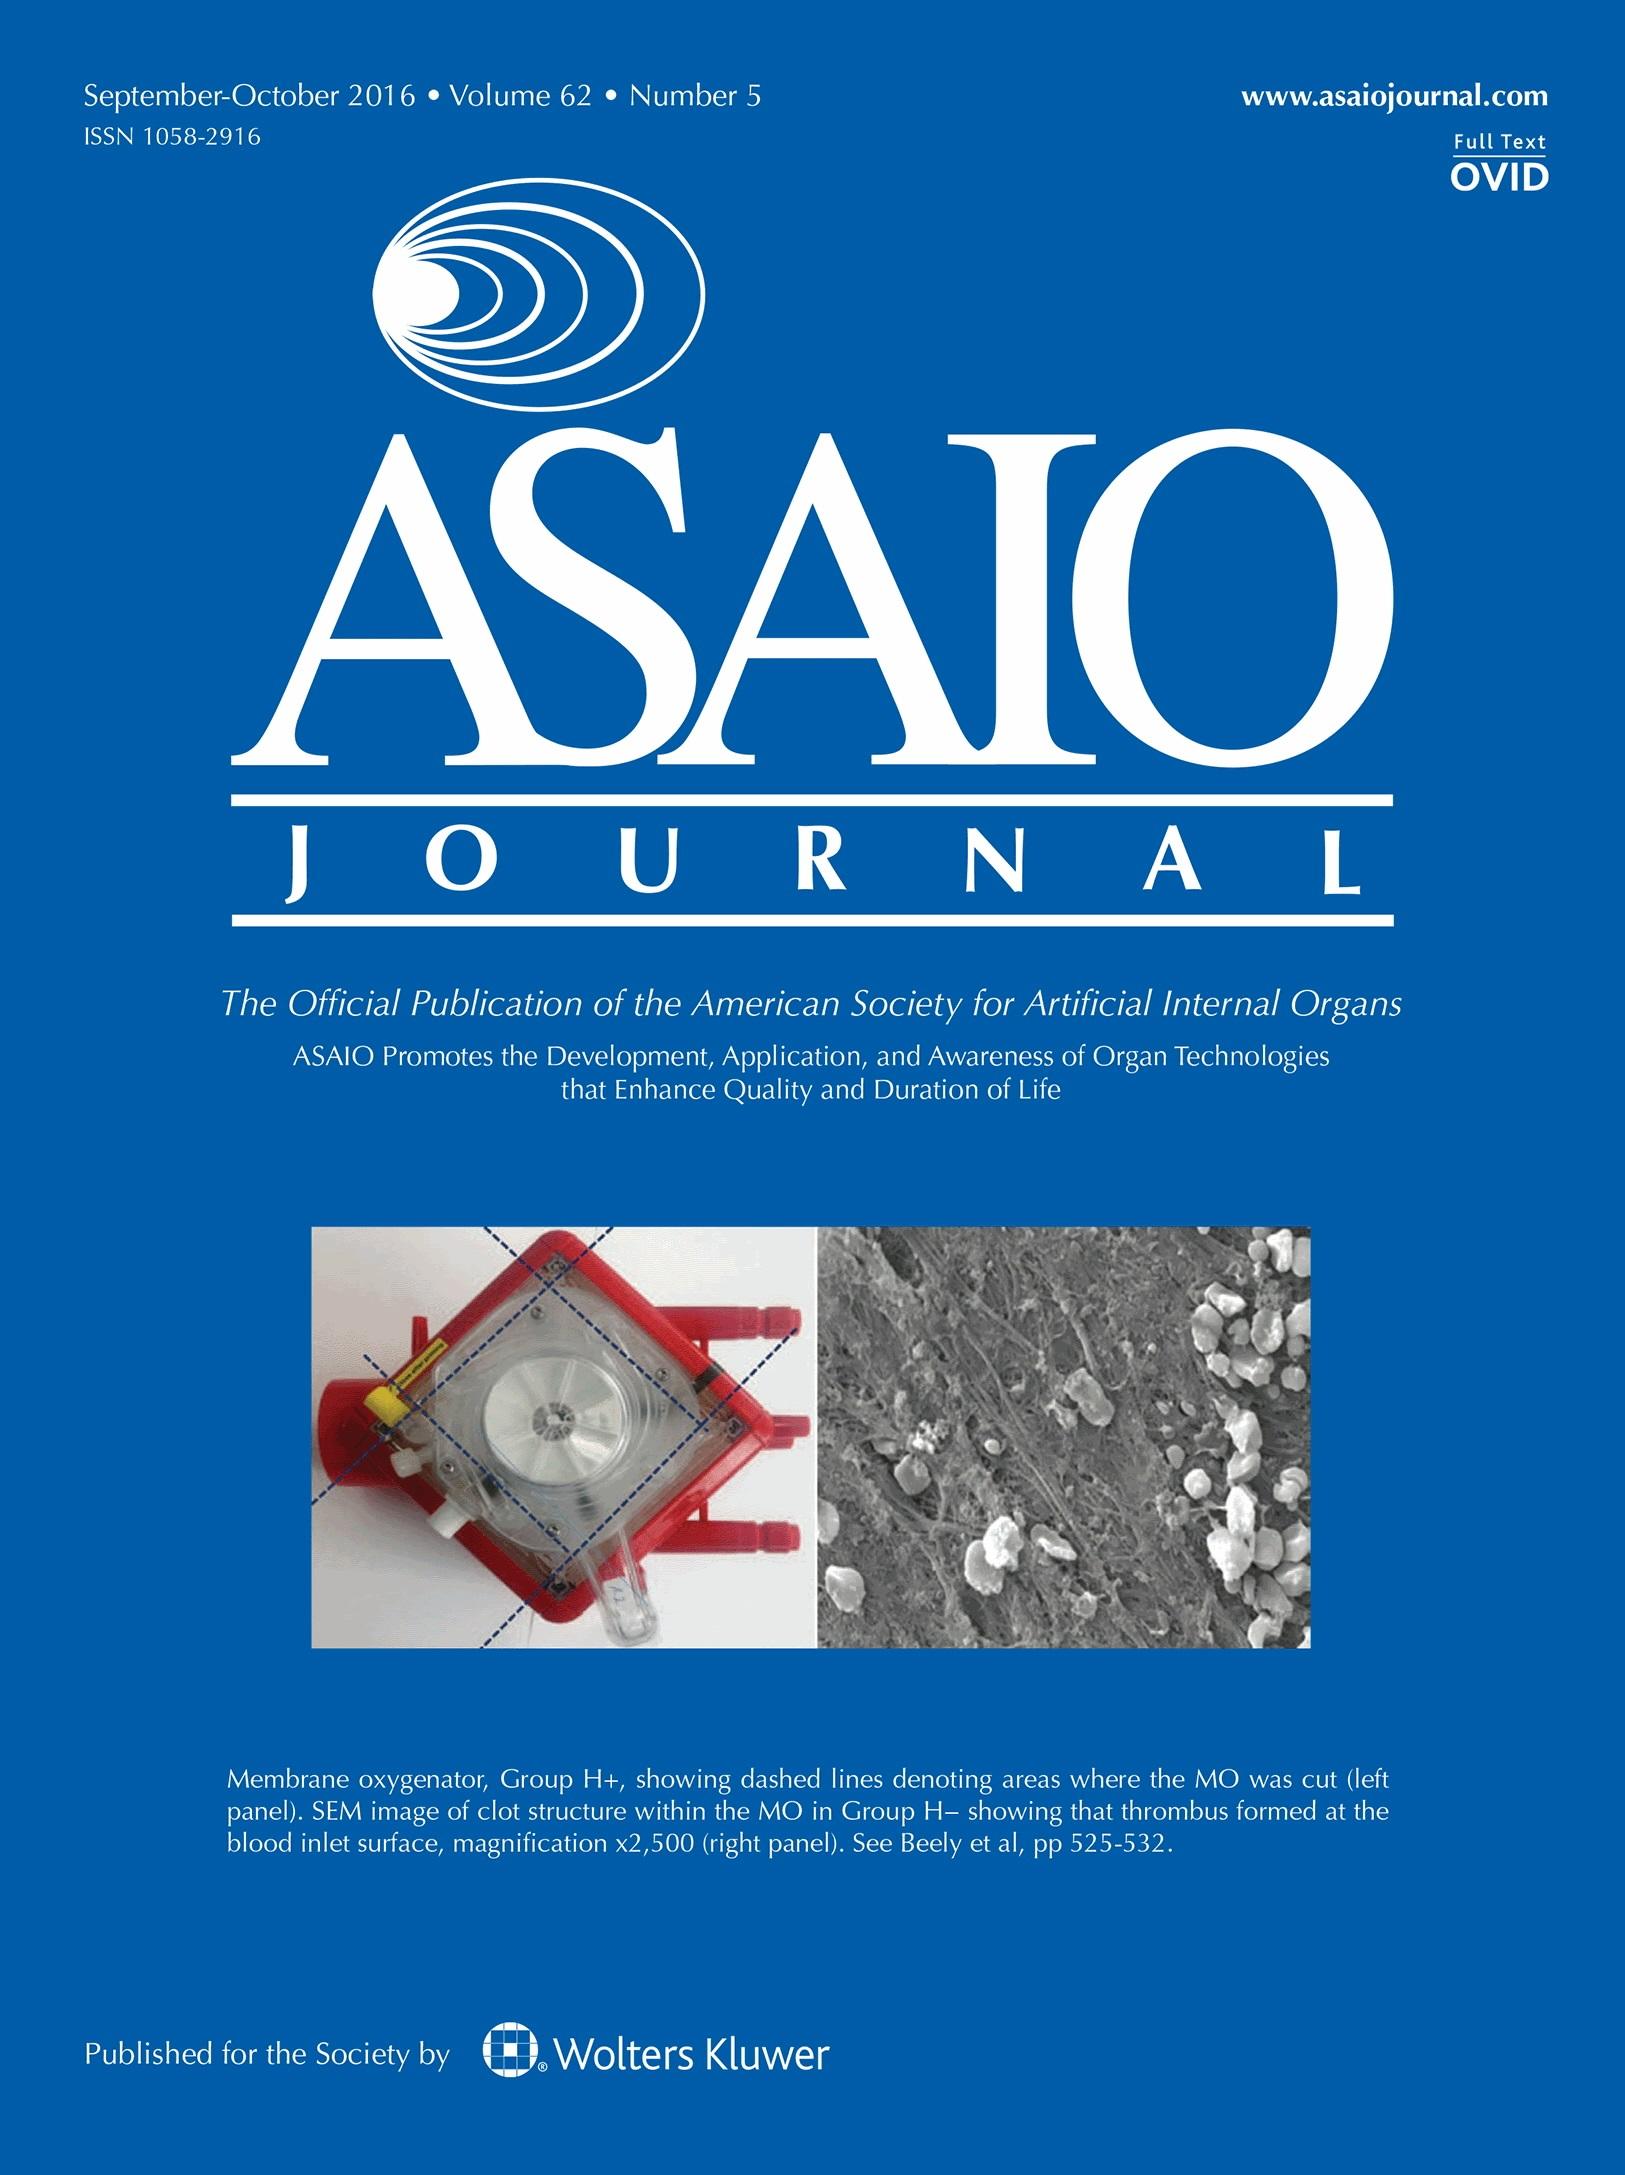 ASAIO Journal